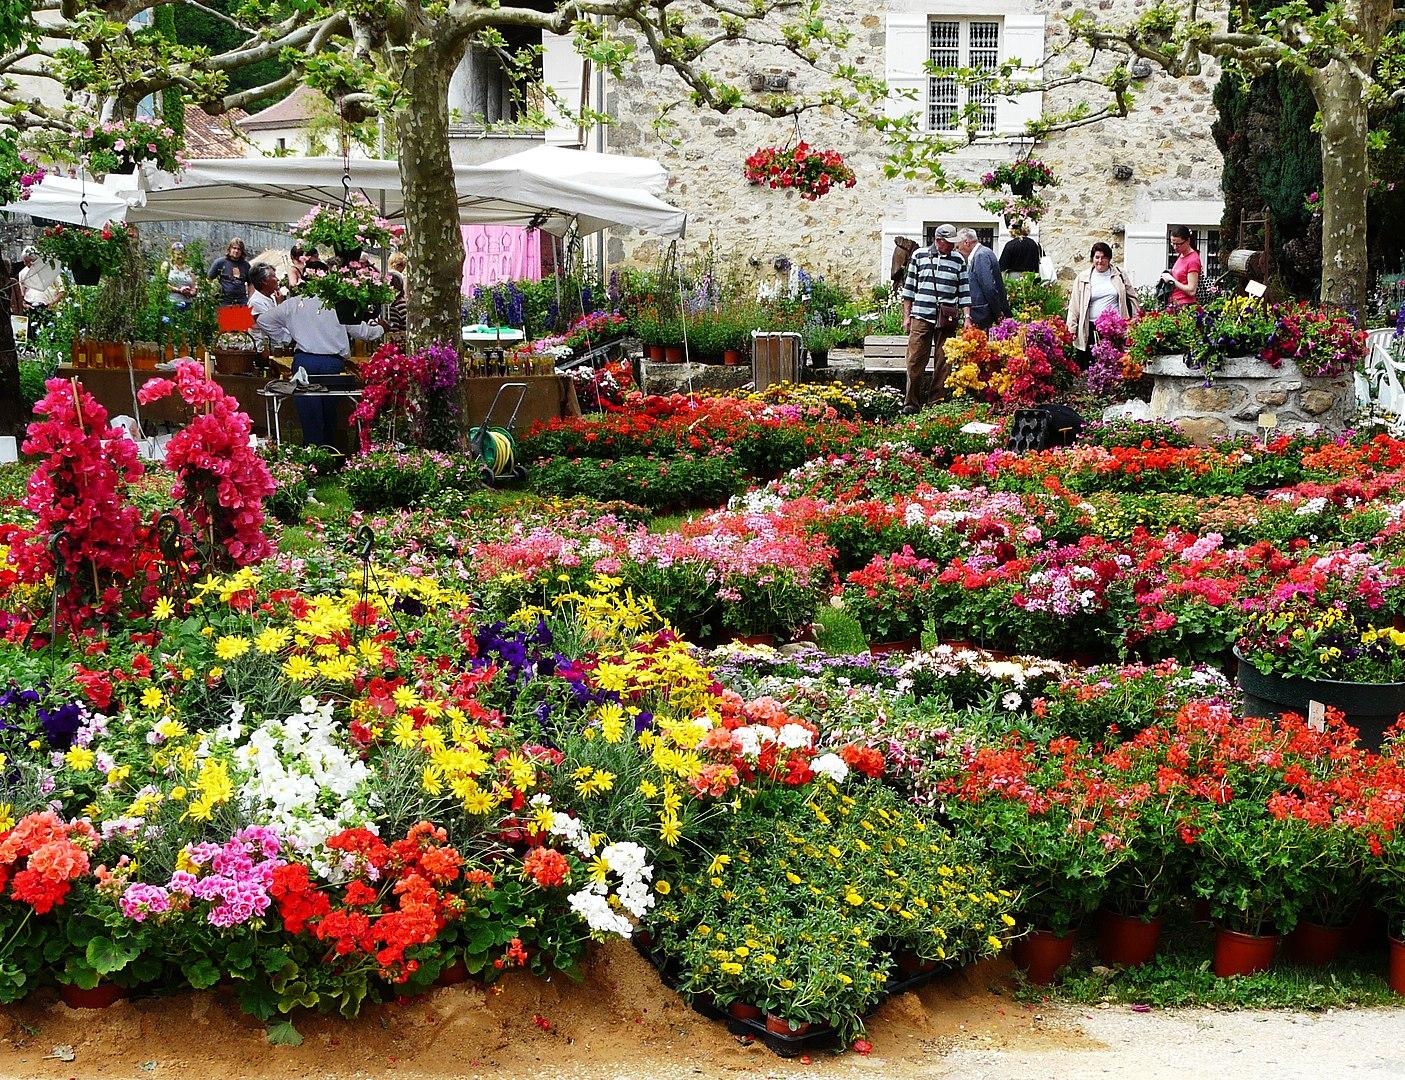 Flower trade - St Jean de Cole